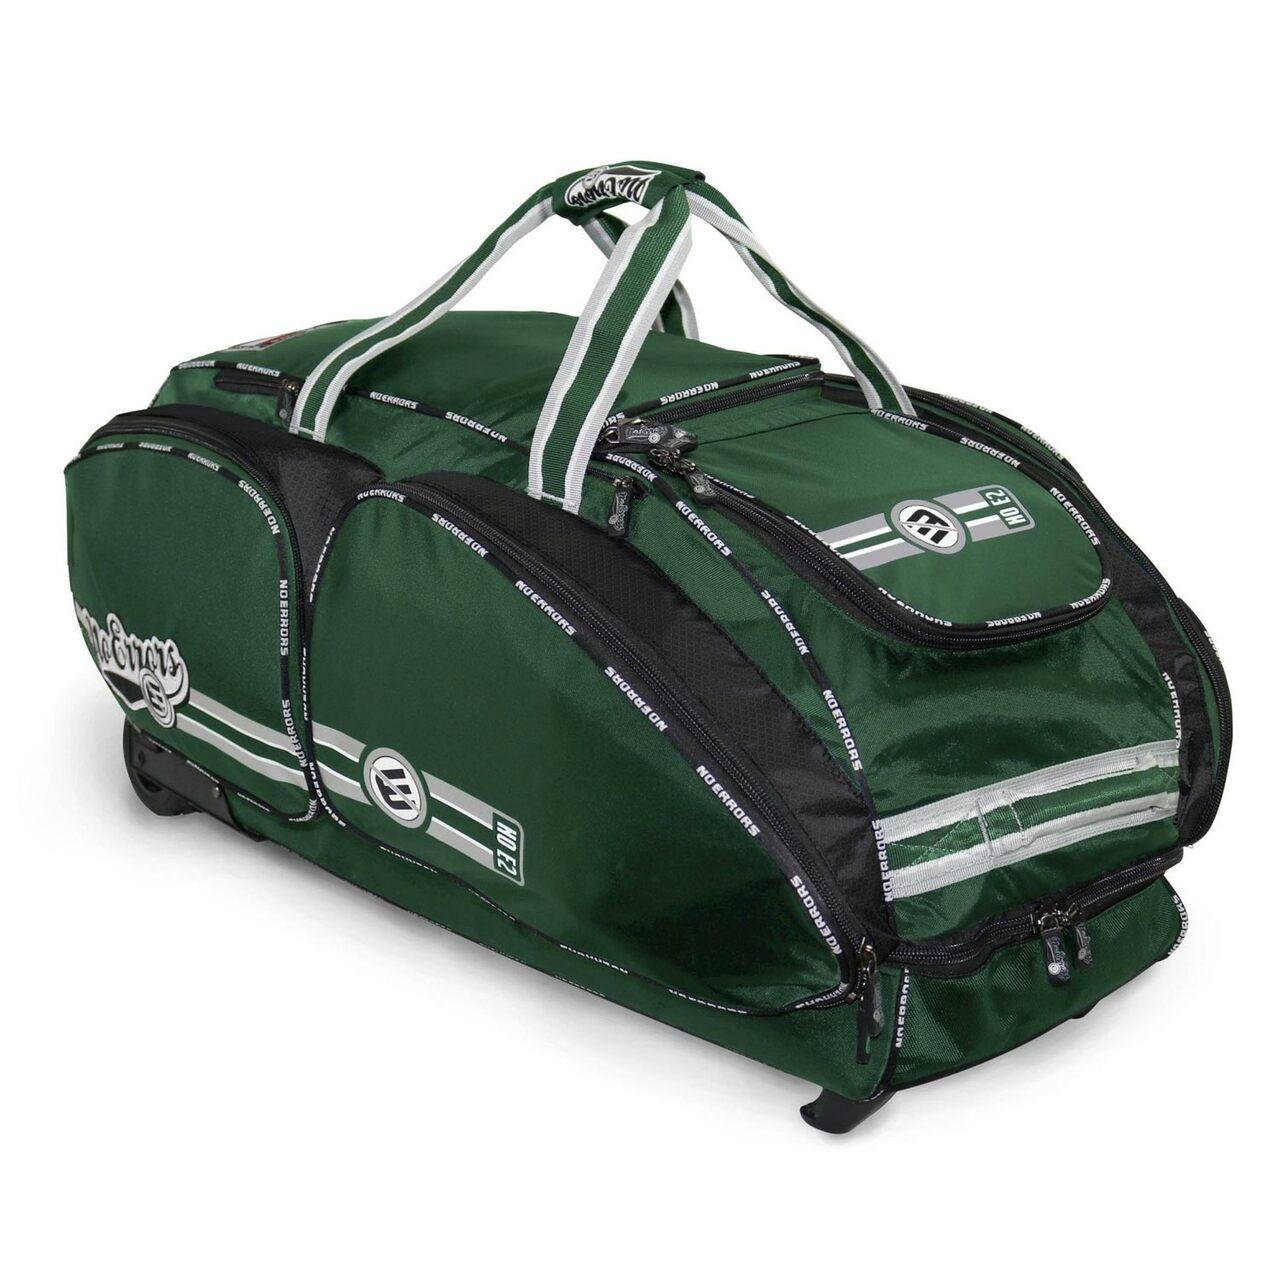 No Errors E2 Catchers Bag green